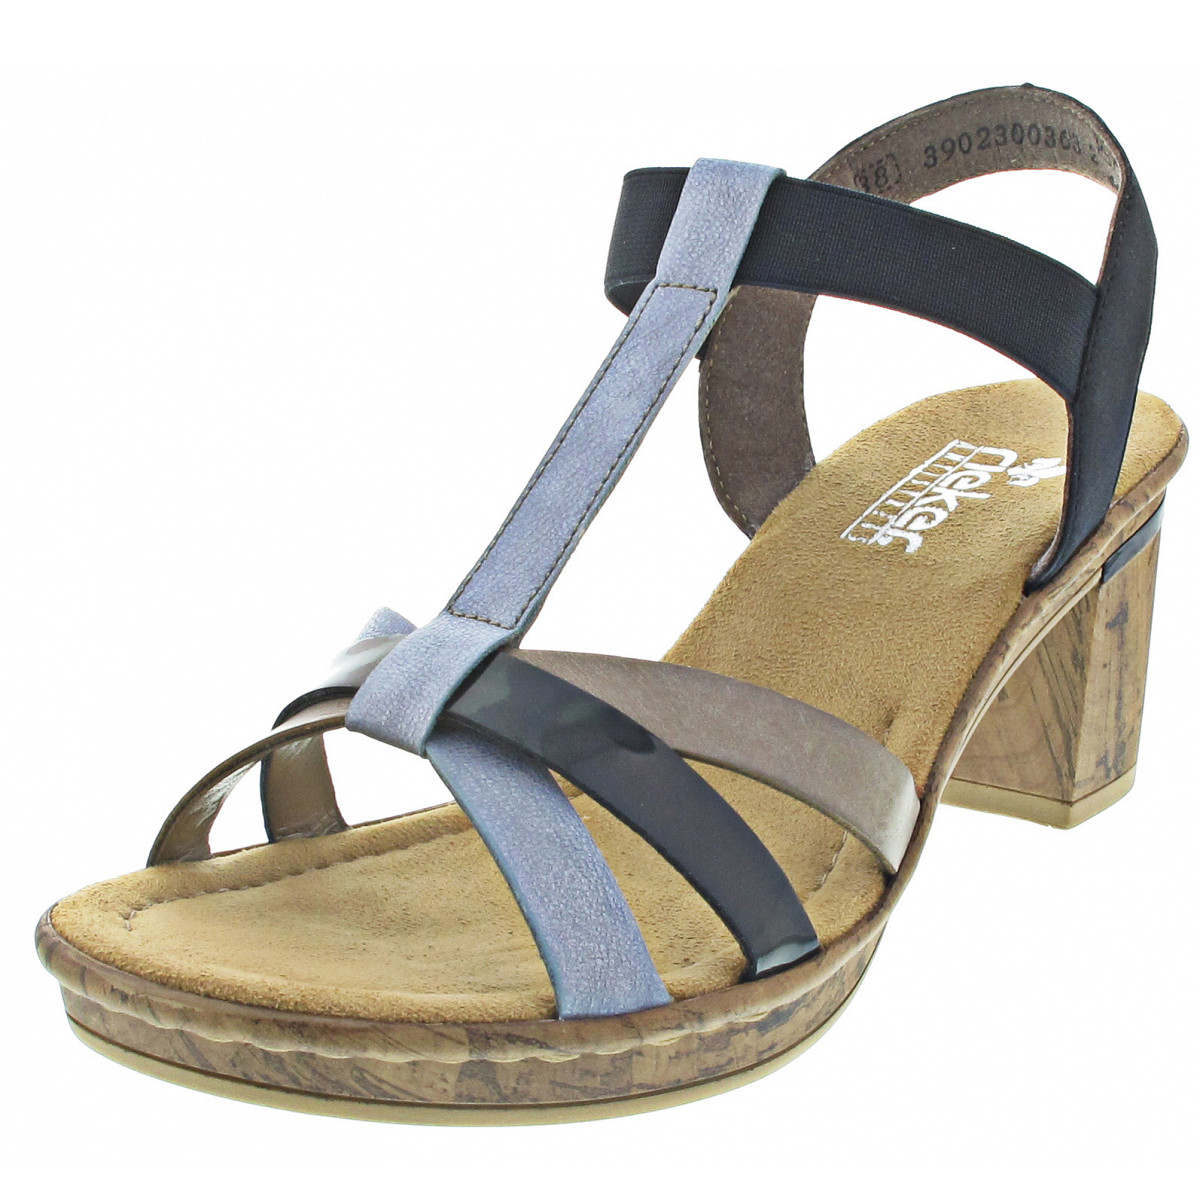 Brütting LI-Boot Girl High V Stiefel TEX blau